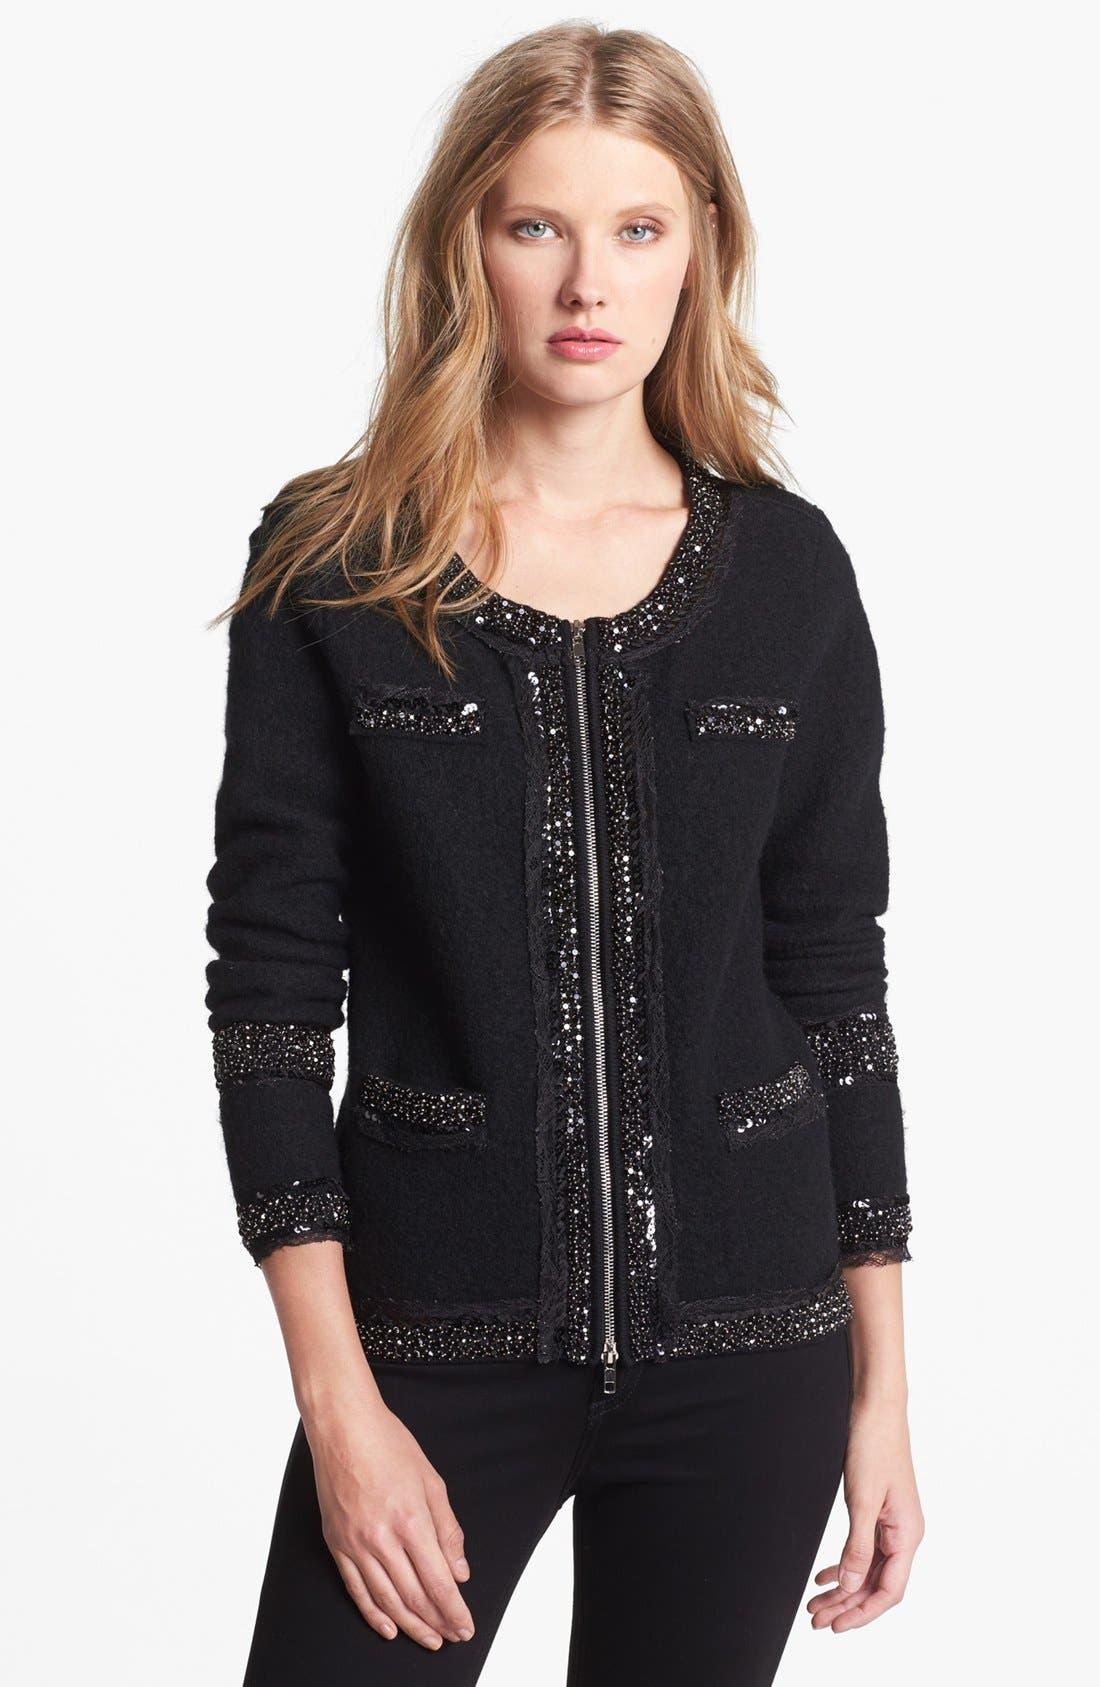 Alternate Image 1 Selected - Diane von Furstenberg Embellished Front Zip Wool Sweater